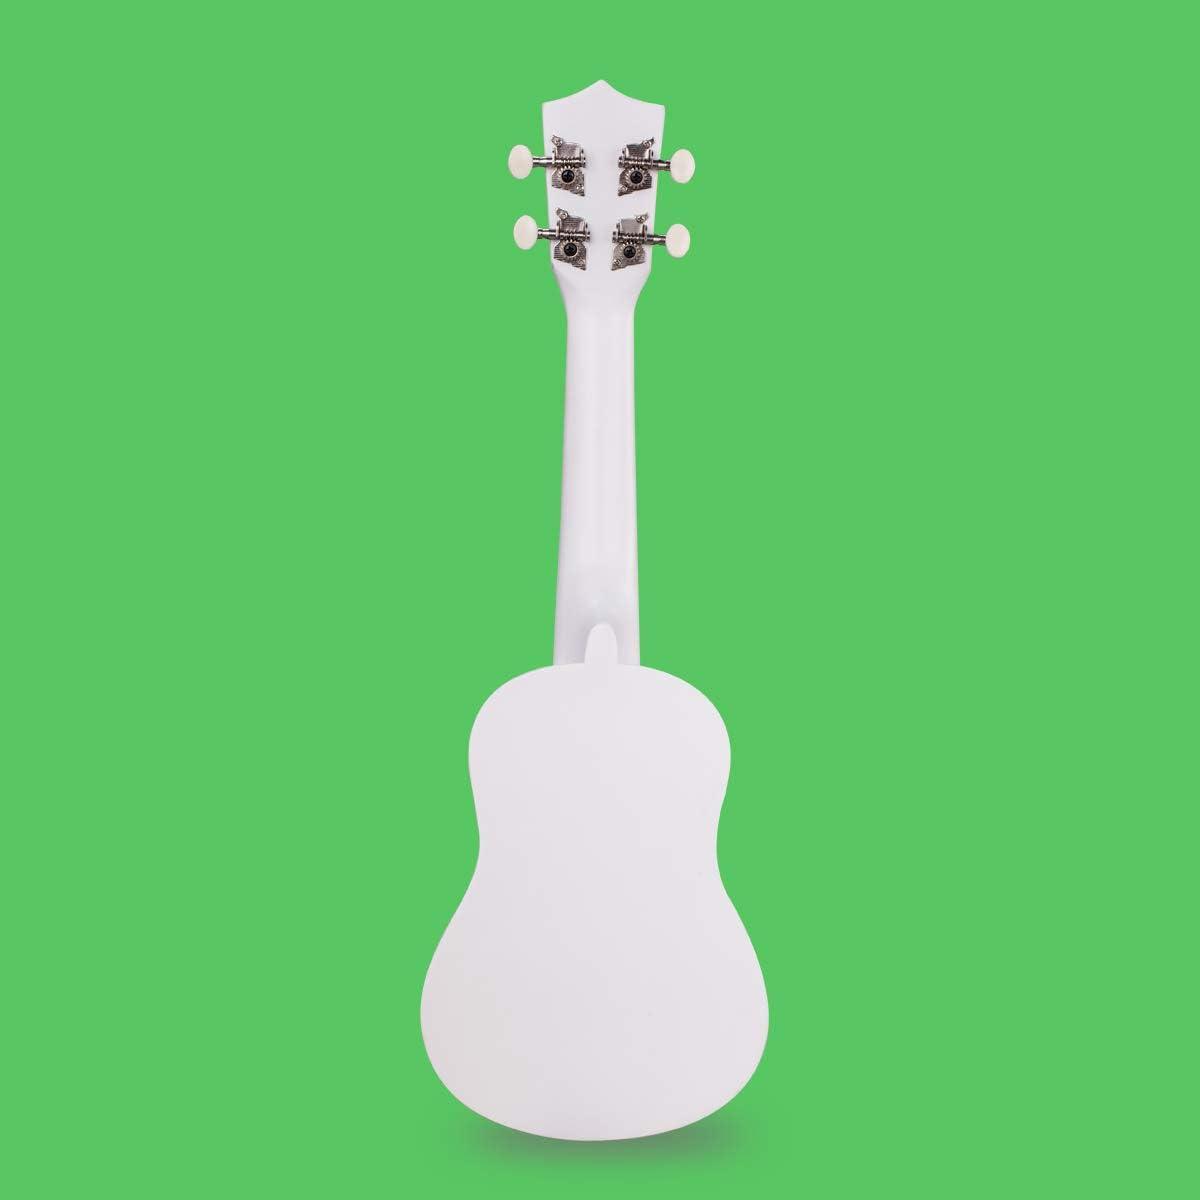 Wooden Ukulele 21 Inch Soprano Hawaiian Guitar Basswood Small Coco White Guitar for Kids Beginner